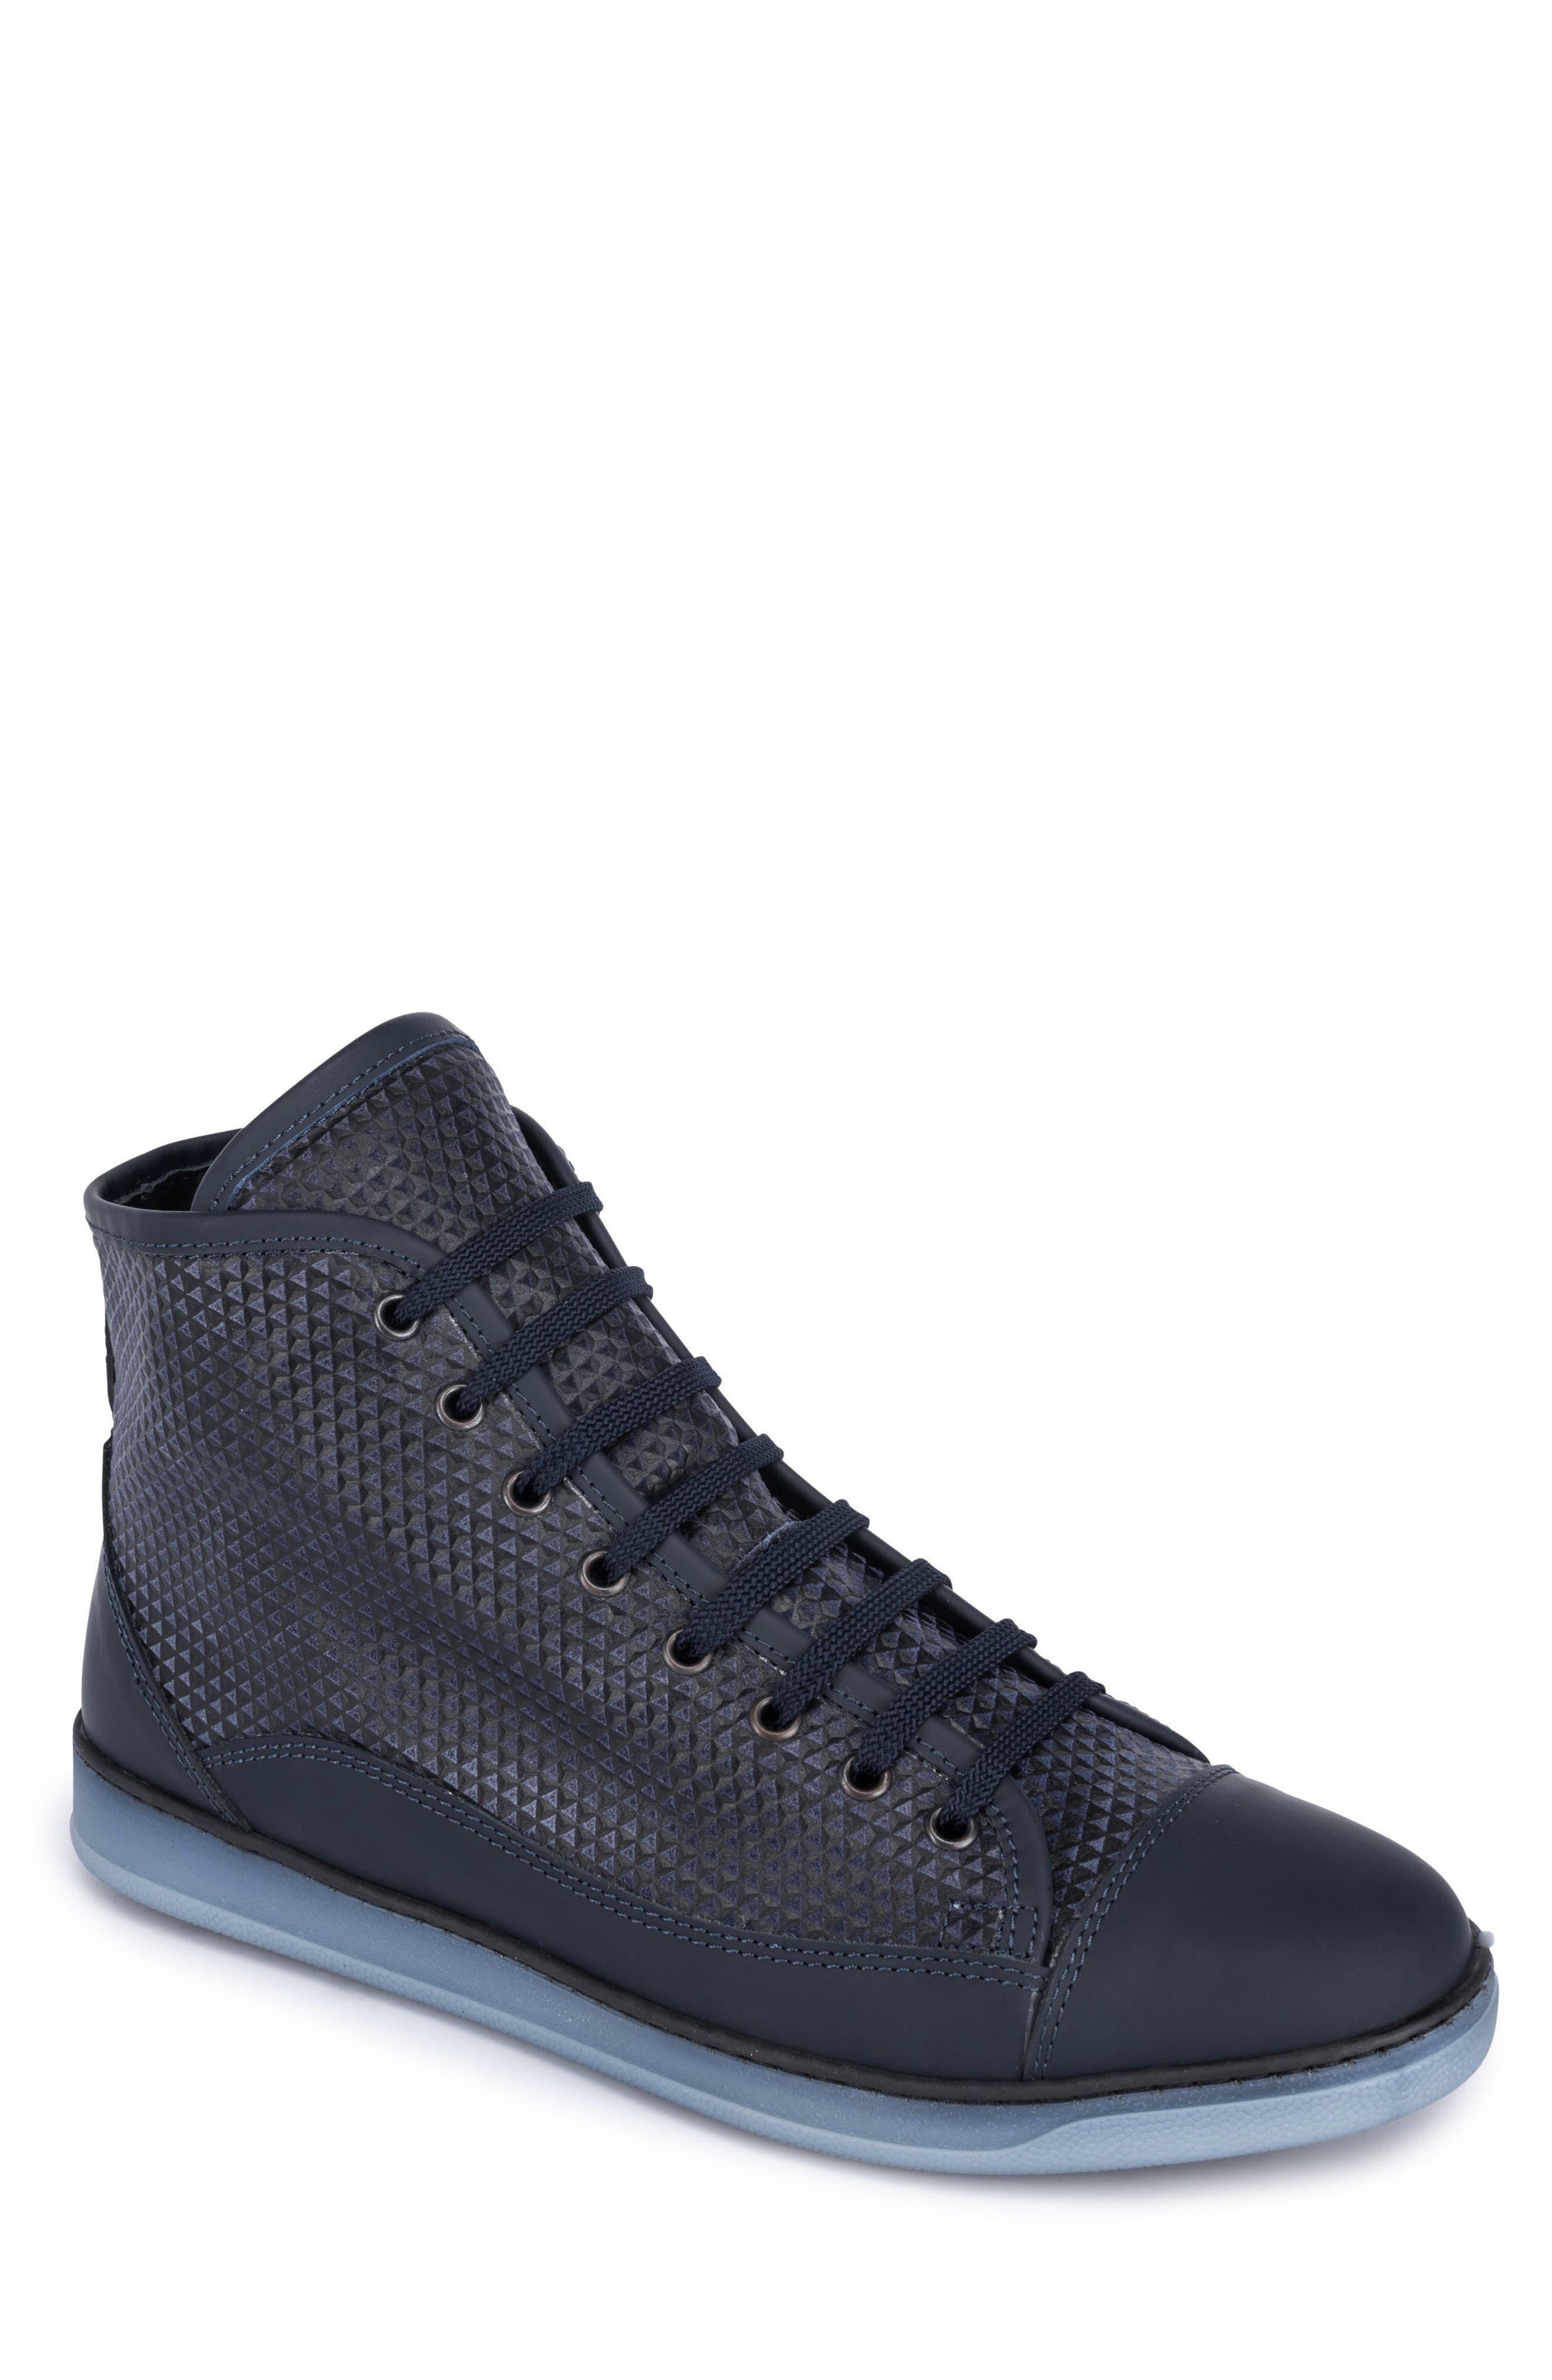 Treviso Sneaker,                             Main thumbnail 1, color,                             409